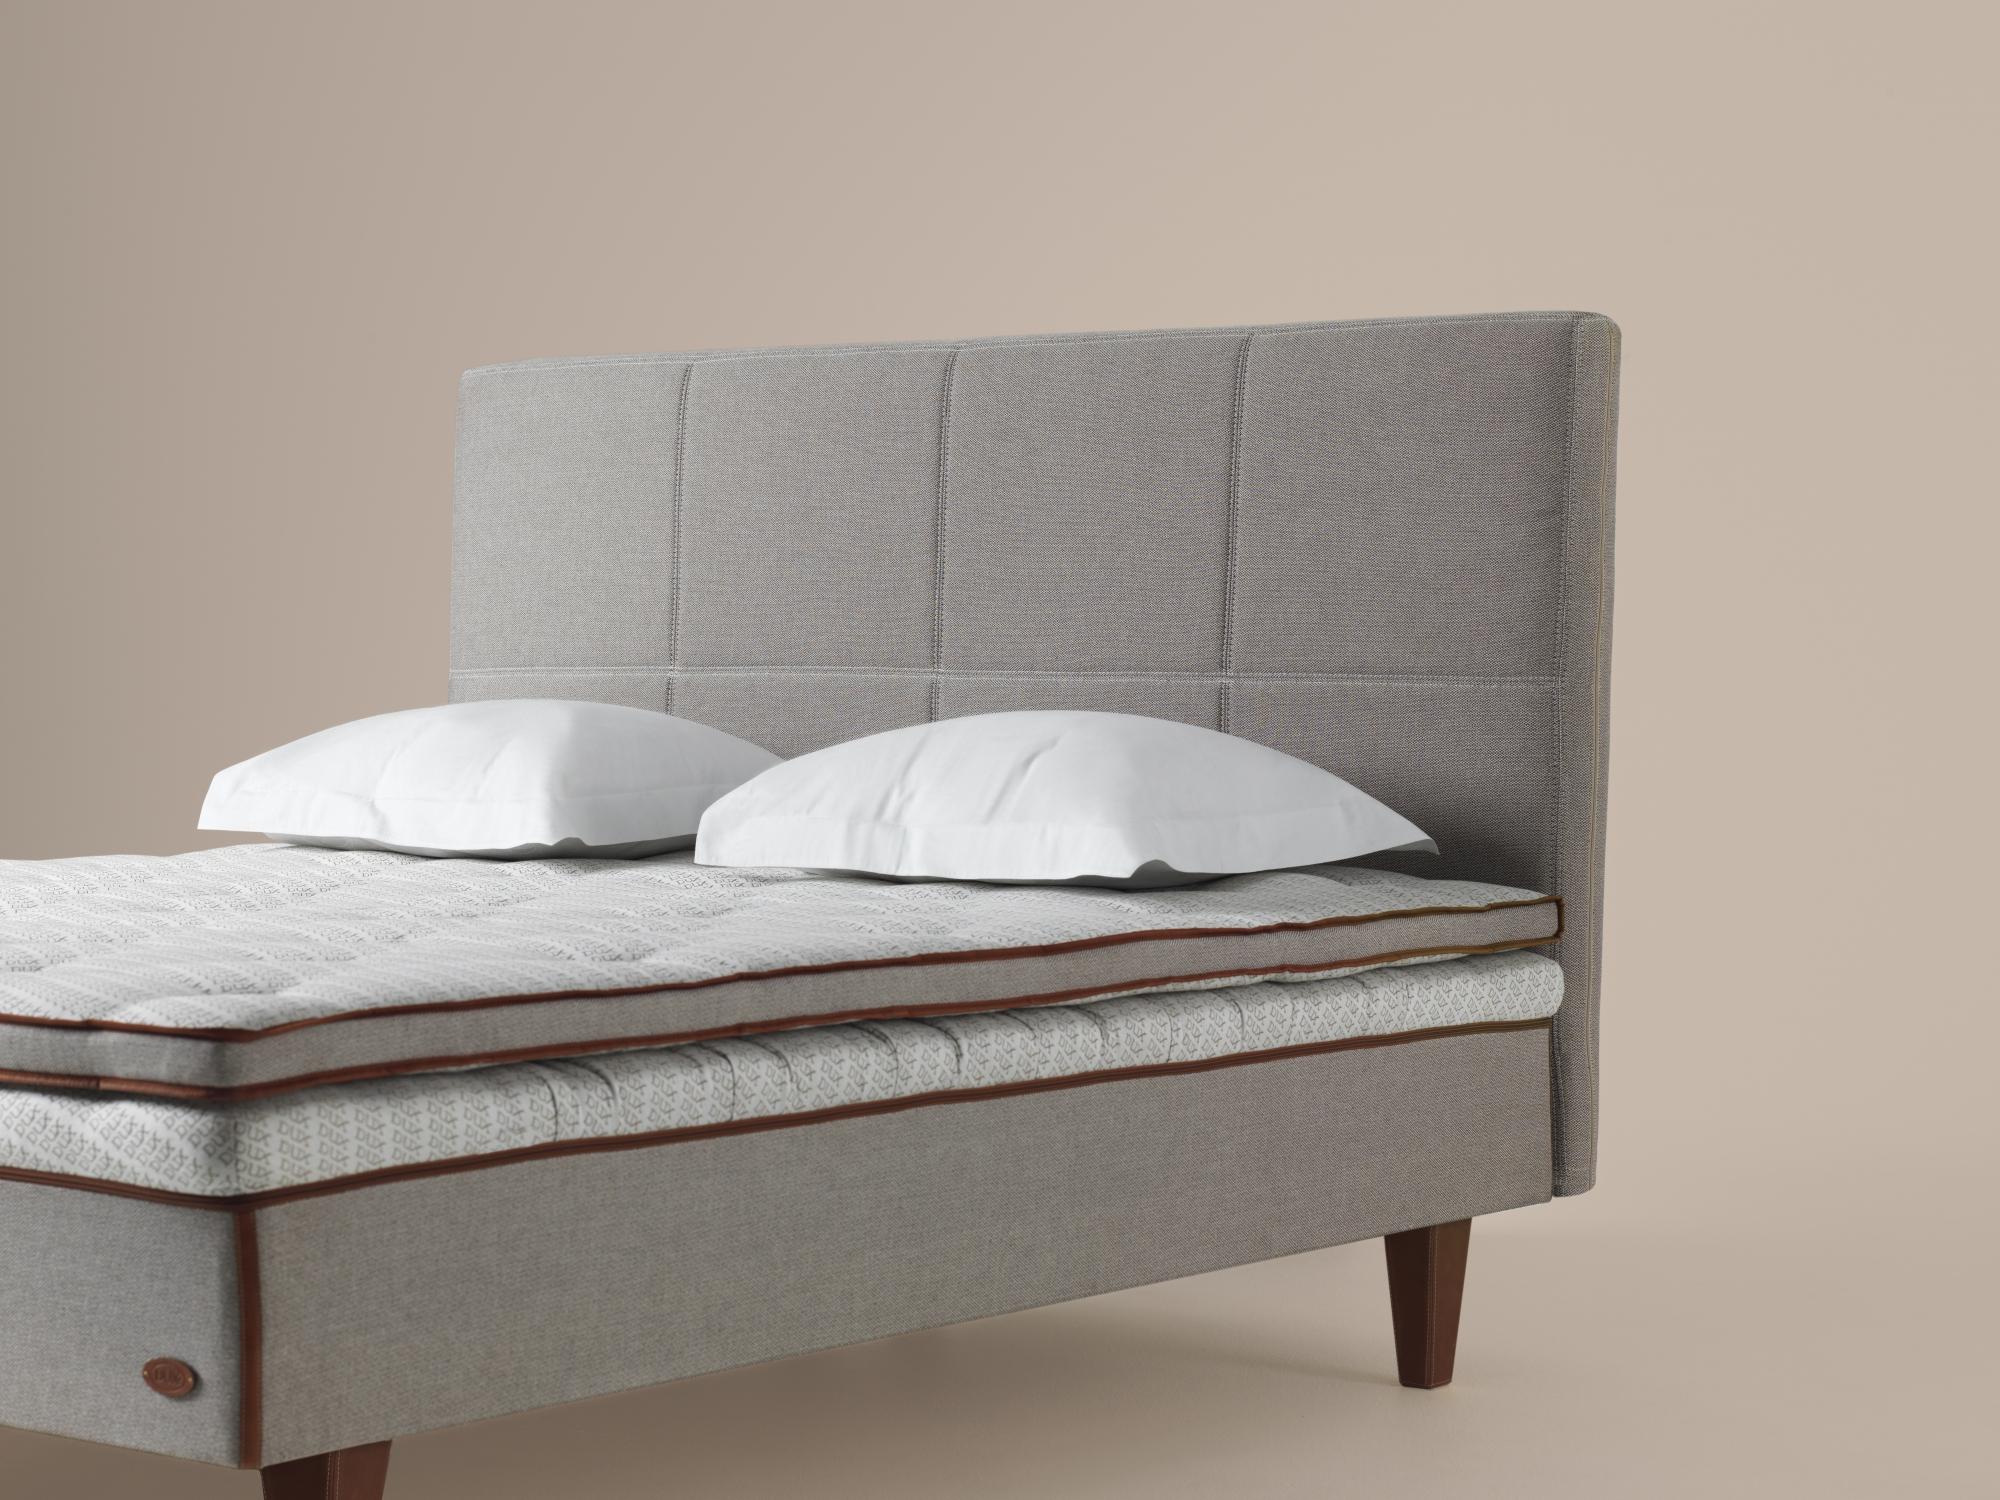 dux senge DUX Quadro Sengegavl   Sengegavle   Timm Møbler A/S dux senge